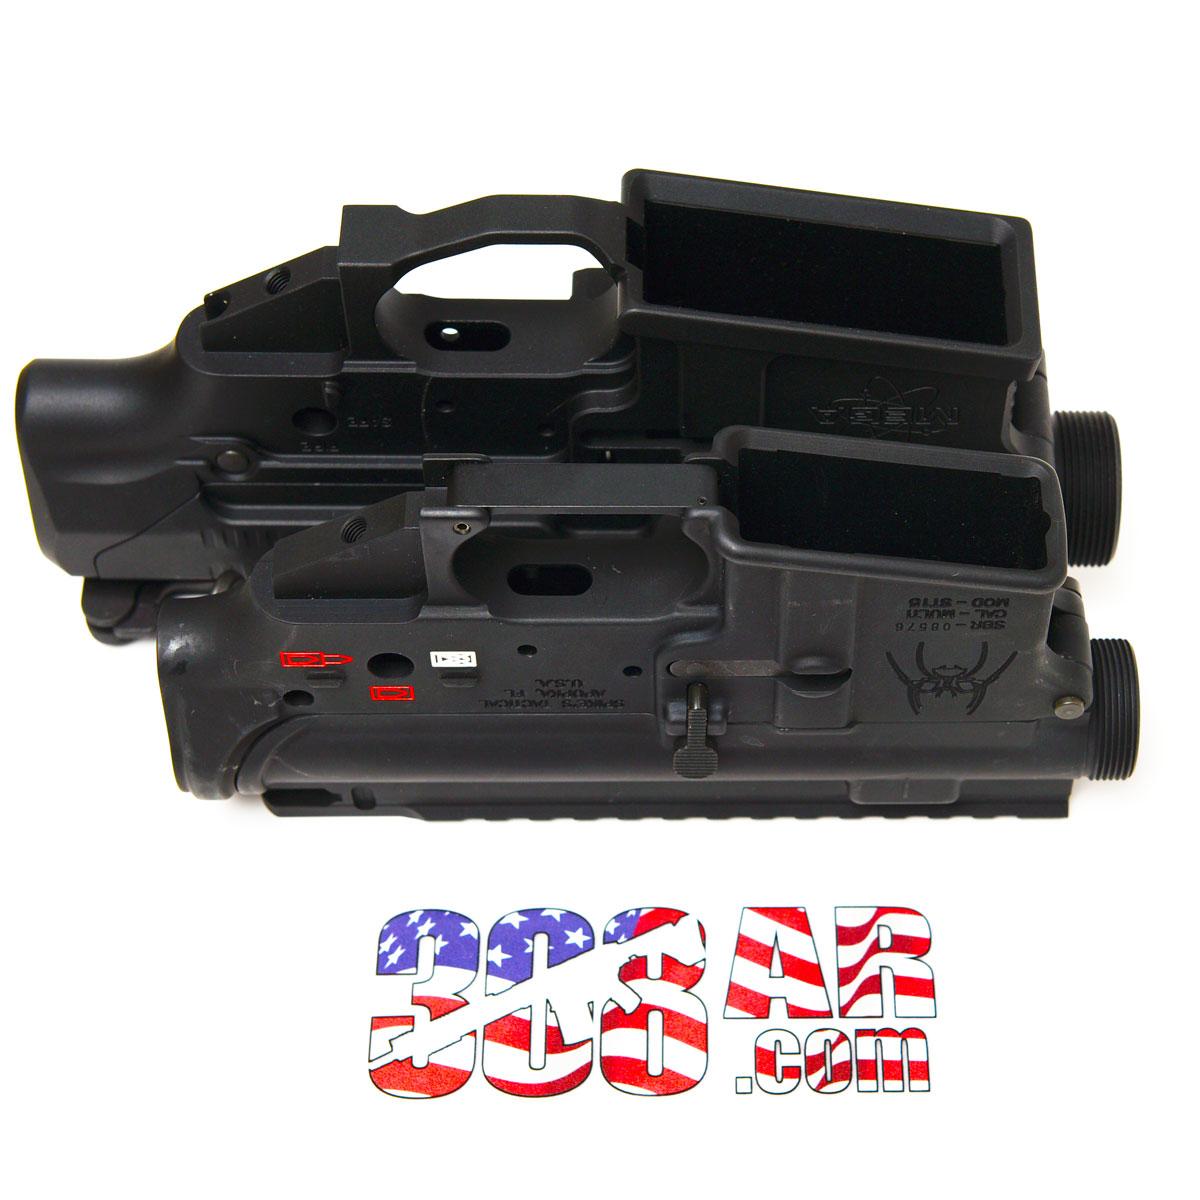 AR-15 Lower Receiver Visually Compared to a 308 AR Receiver